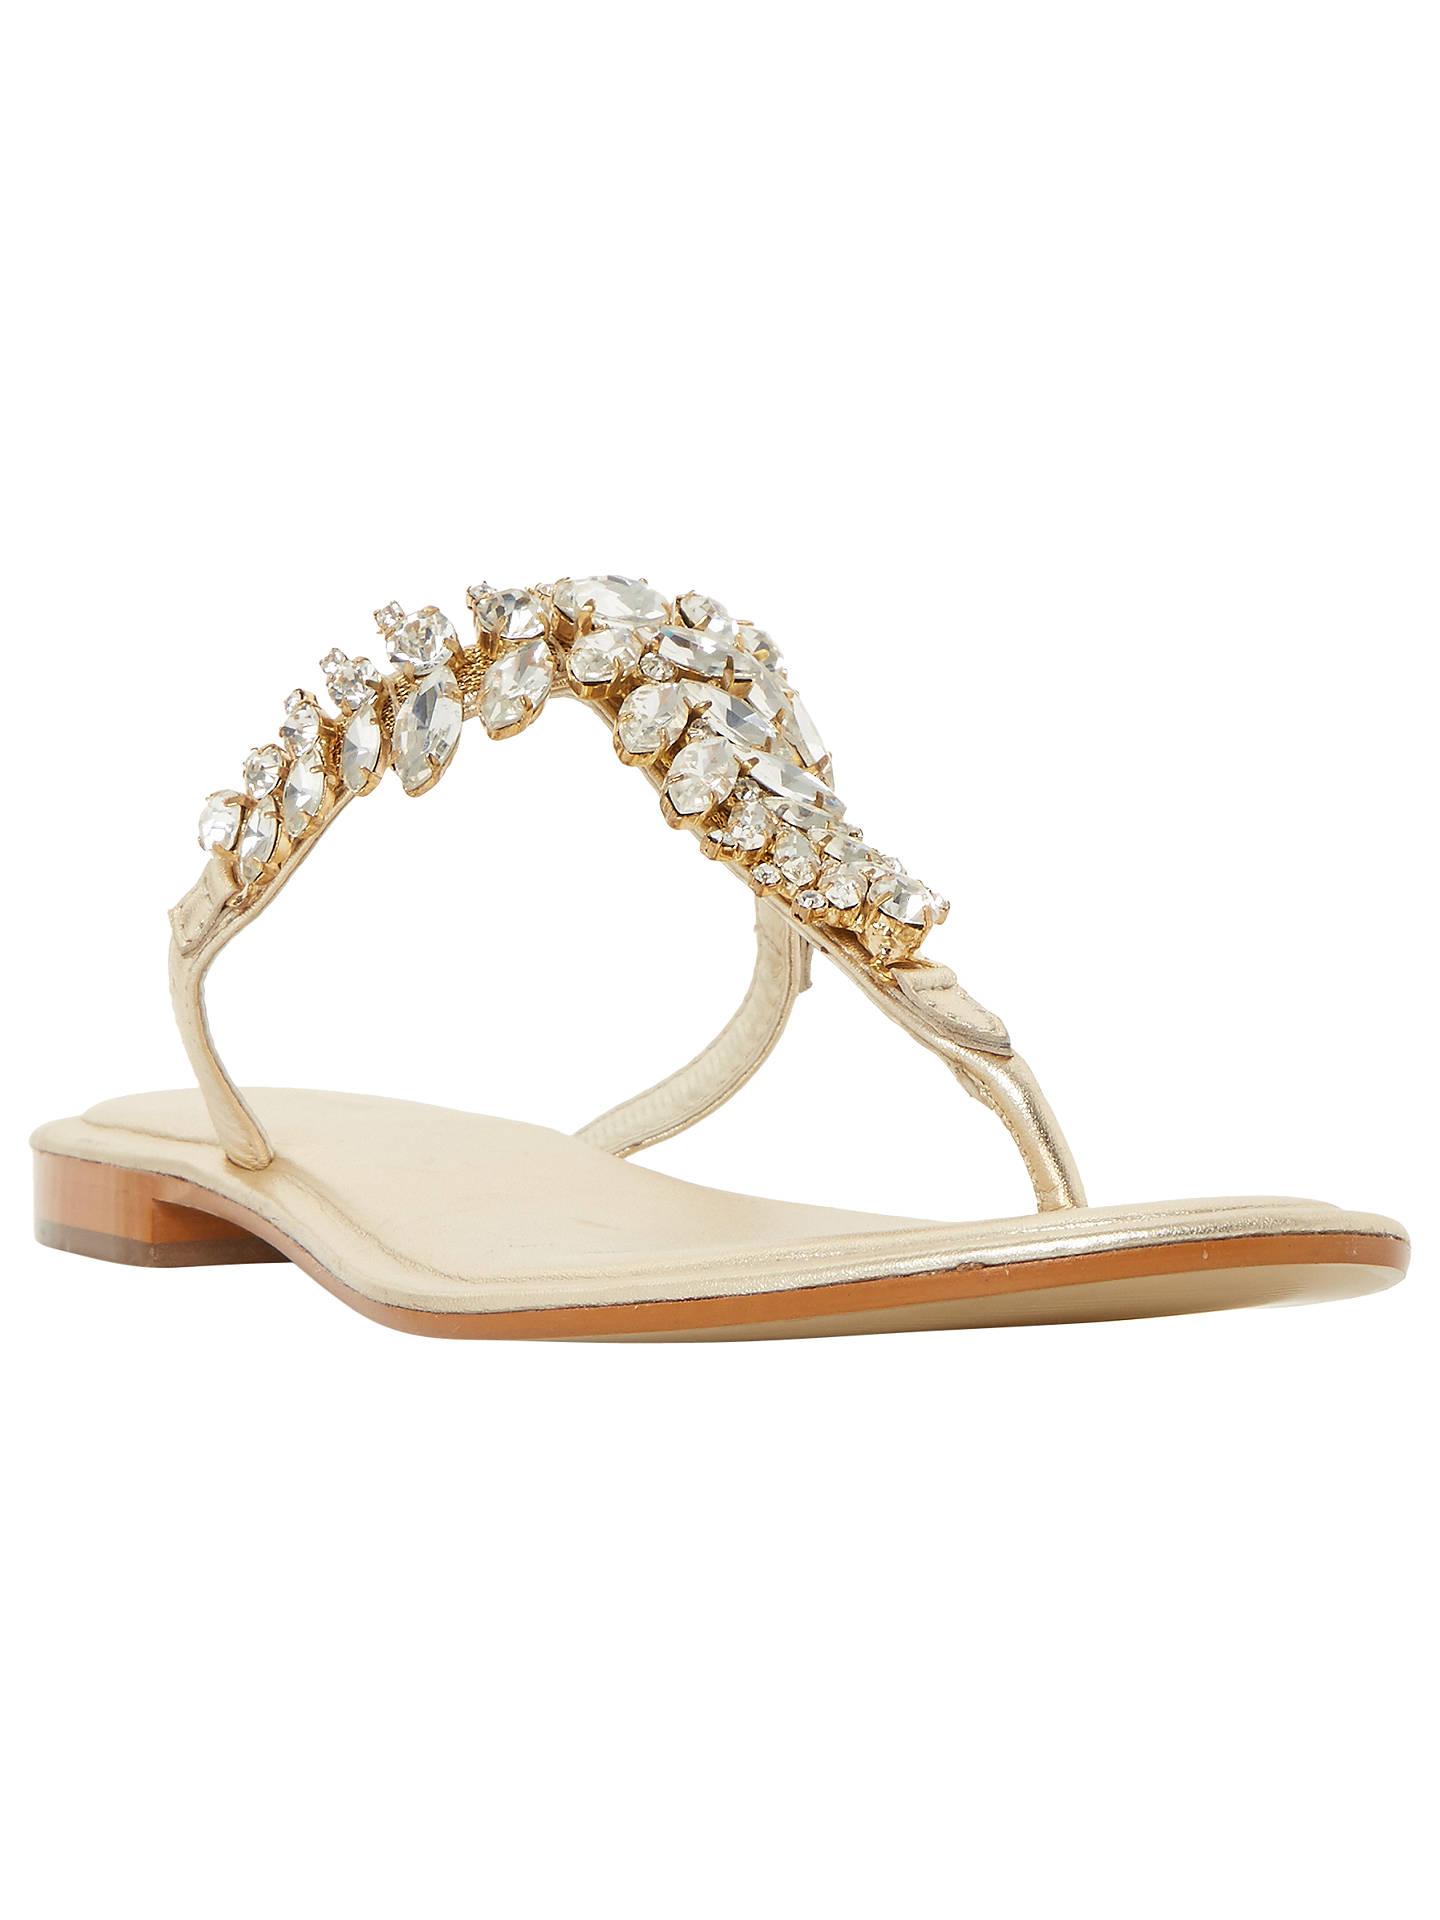 8fa43275086c04 Dune Nara Jewelled Toe Post Flat Sandals at John Lewis   Partners